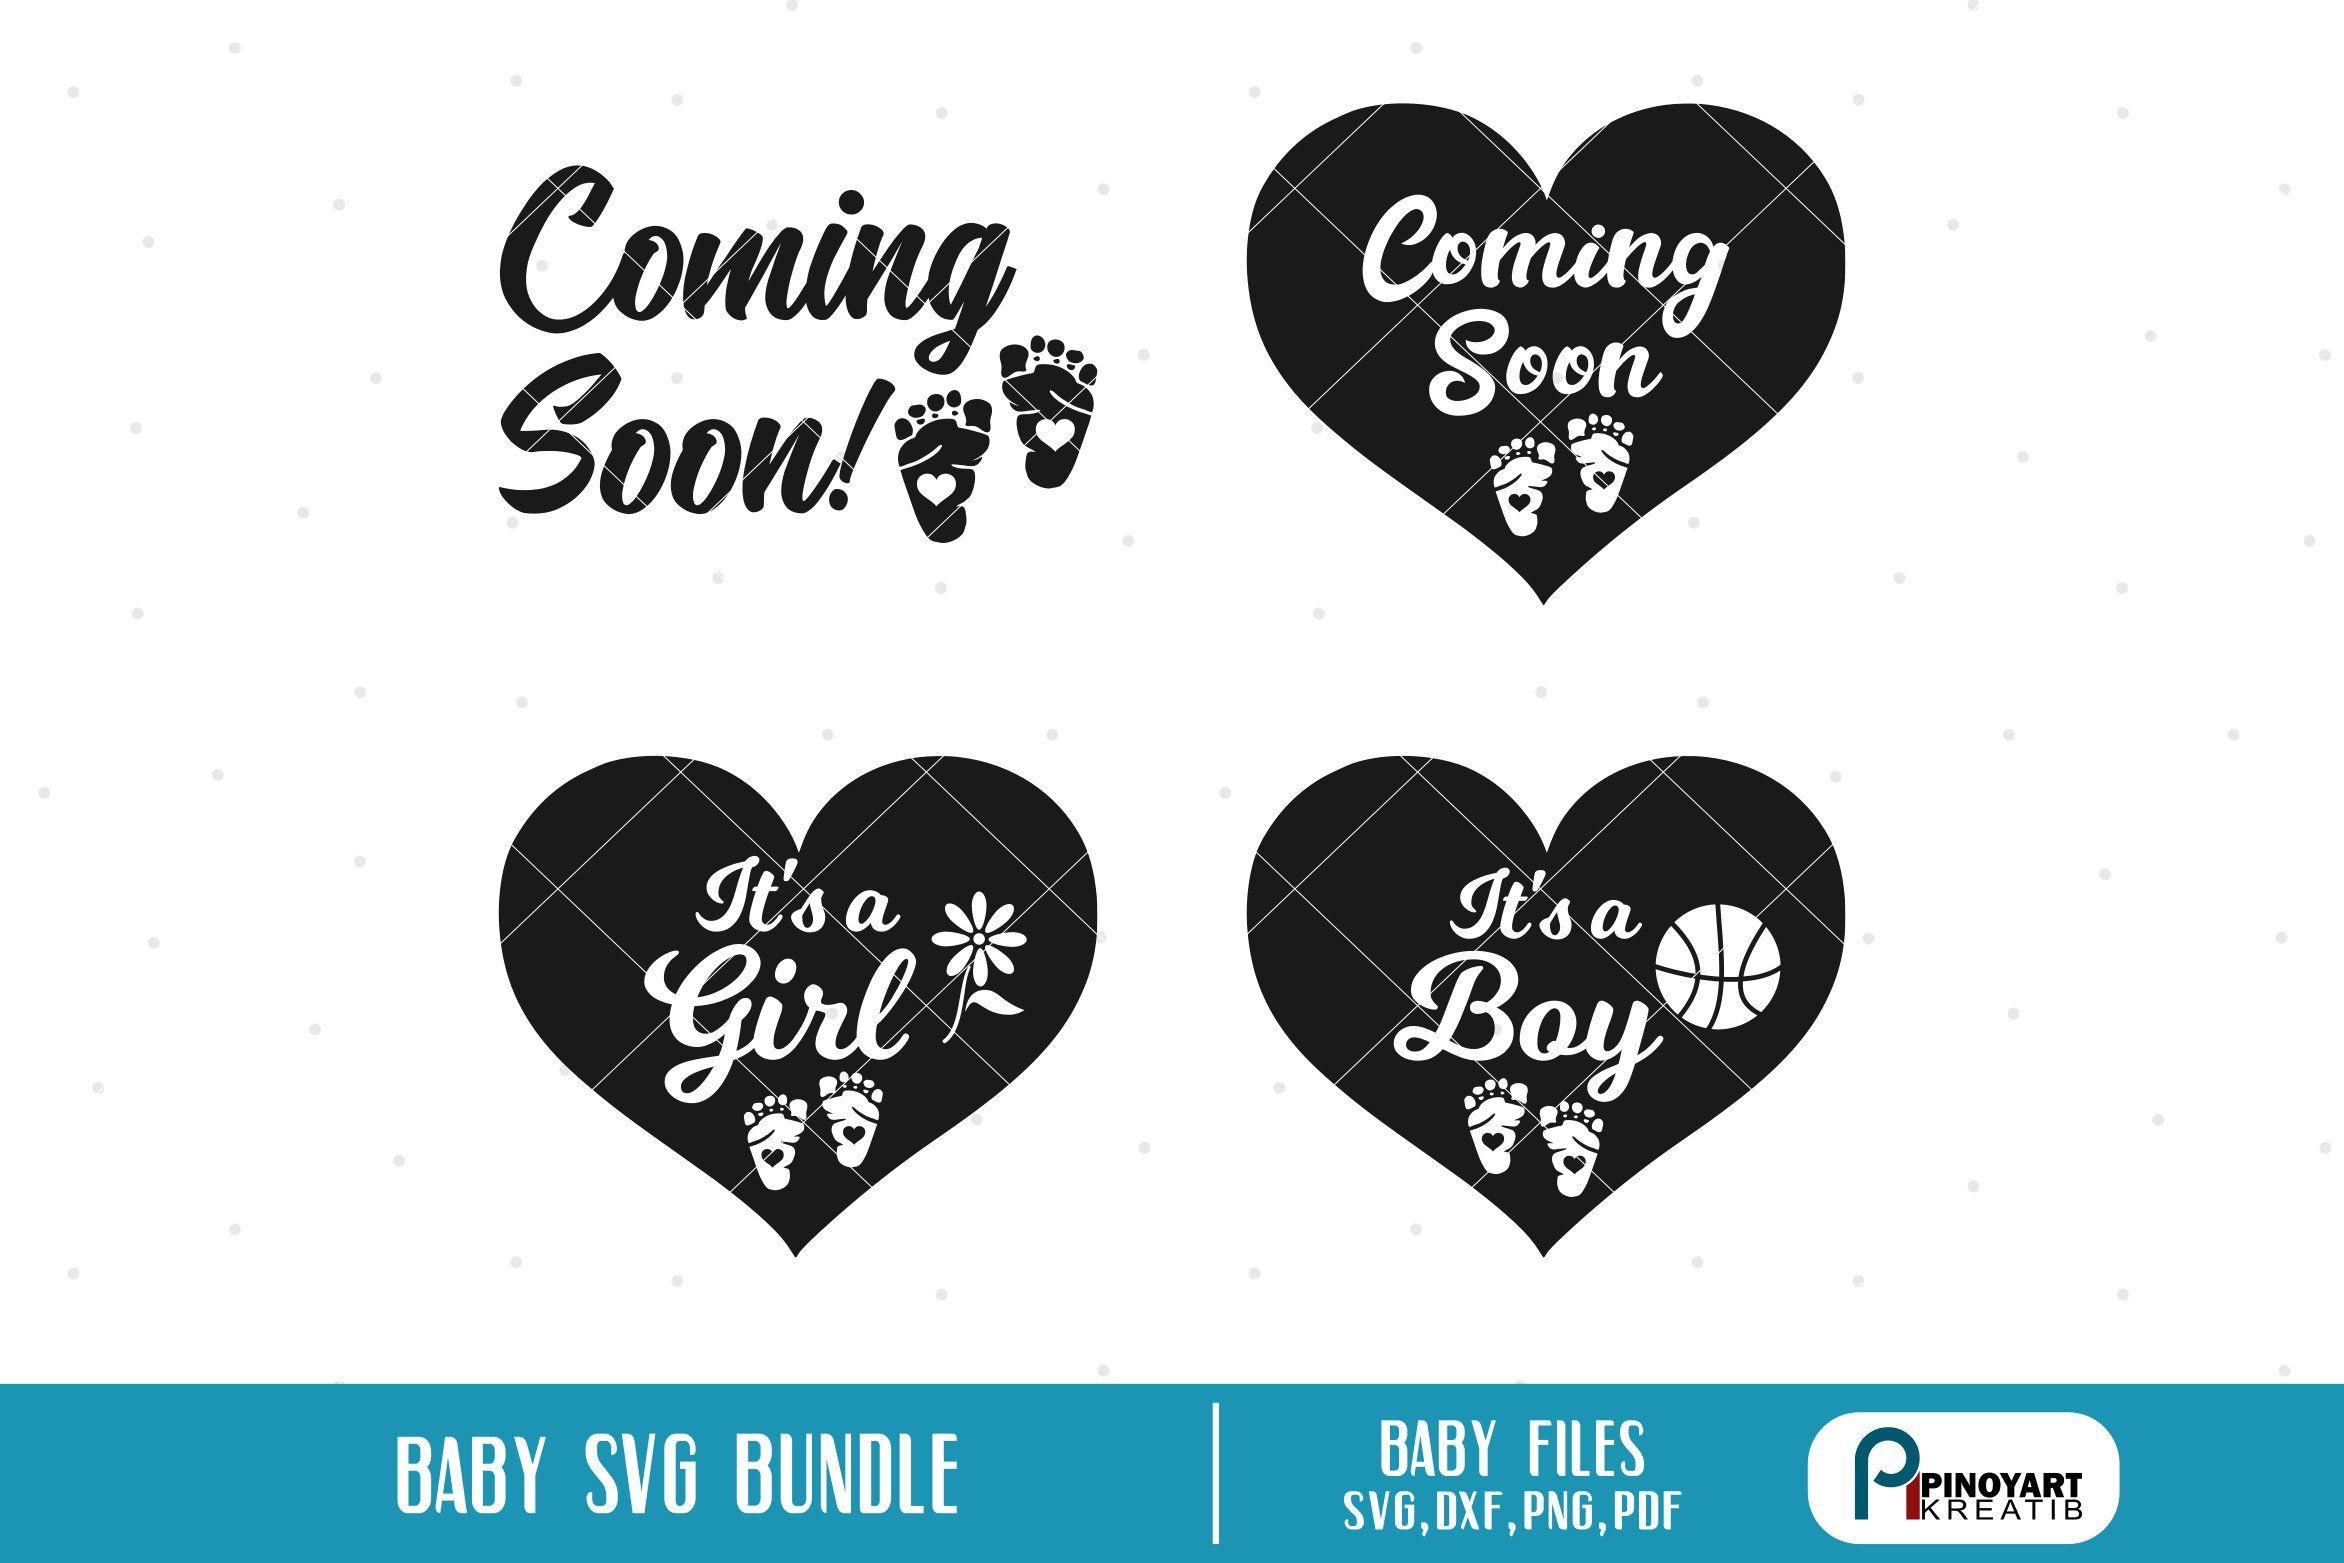 Baby svg, baby svg file, it's a girl svg, it's a boy svg